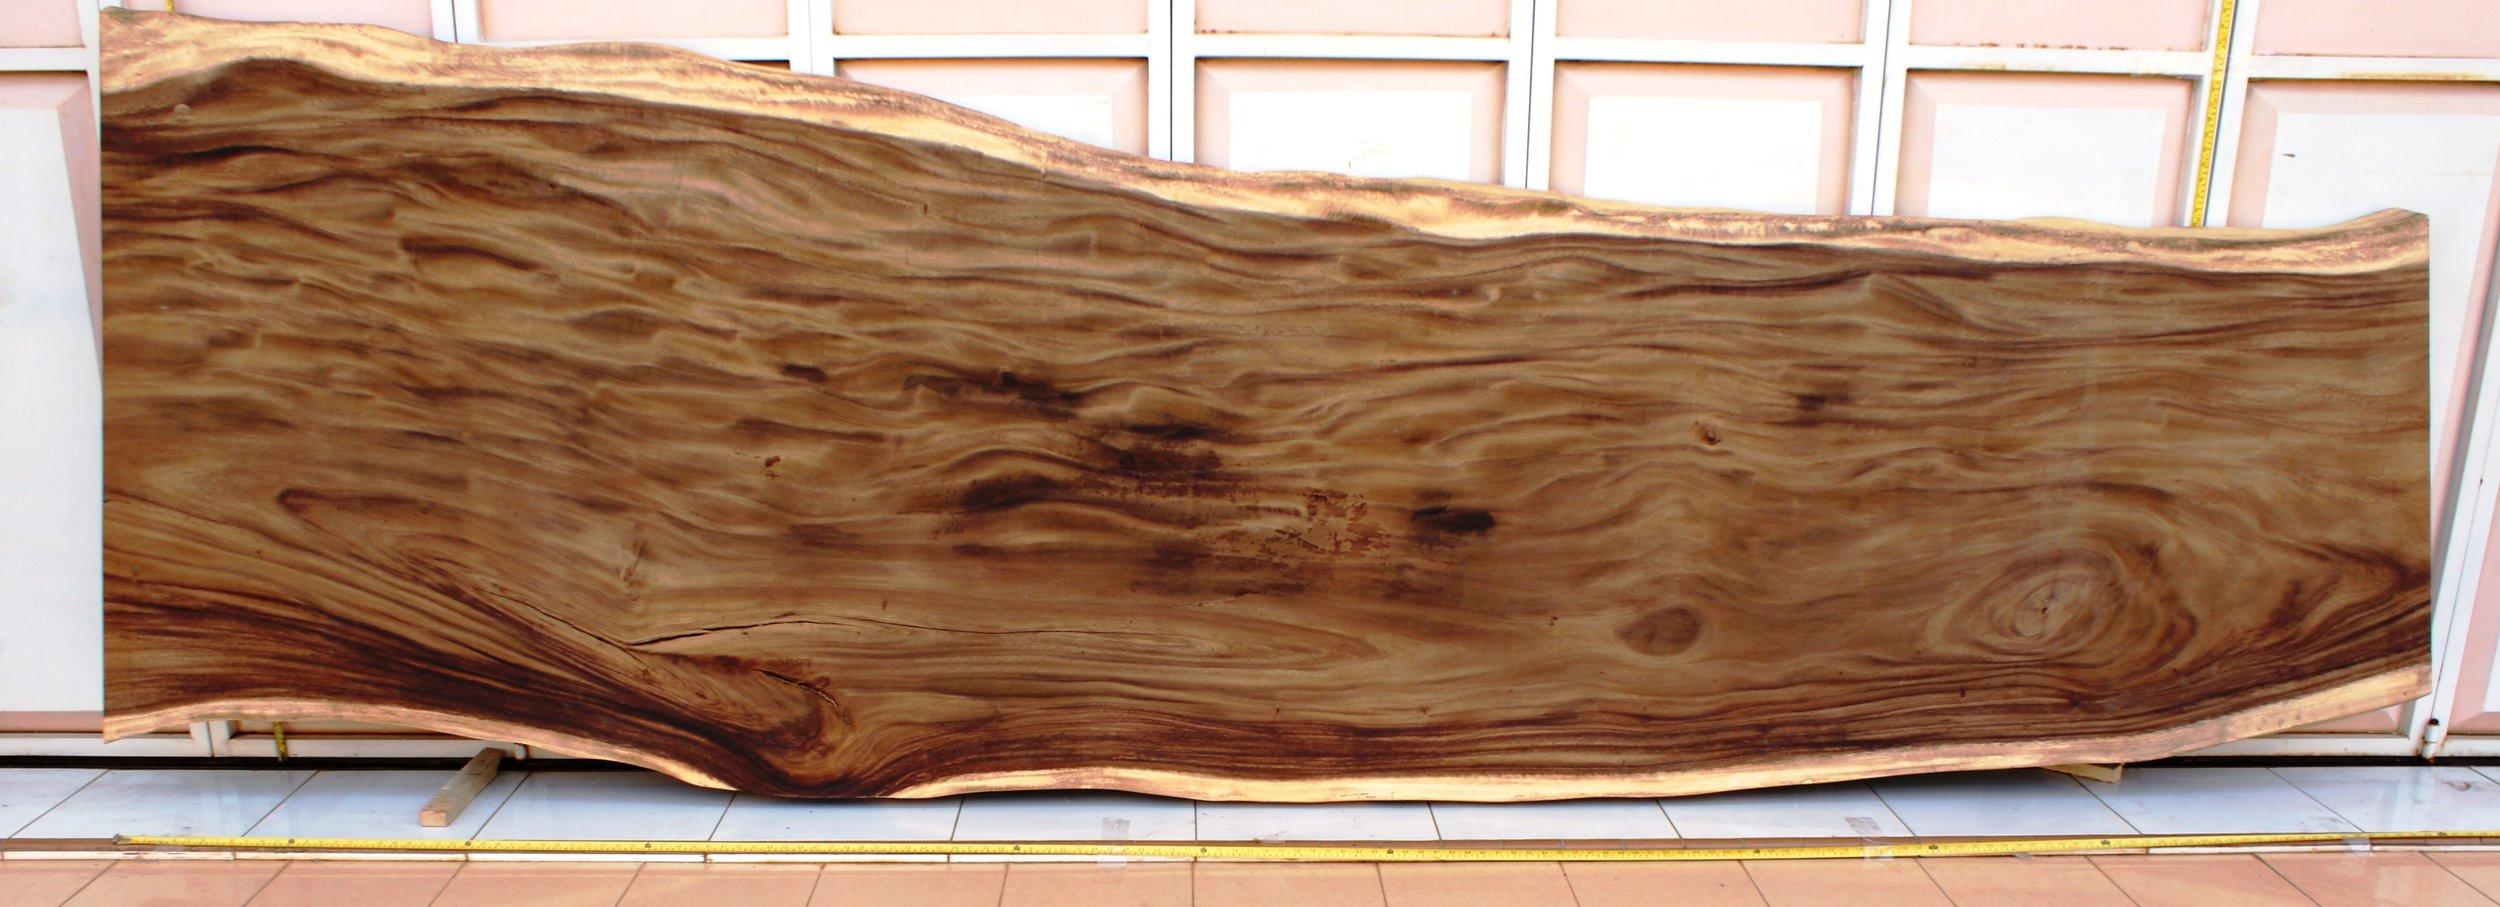 SUAR  Материал: слэб дерева  суар  Размеры: 400 x 95-115 х 9 см